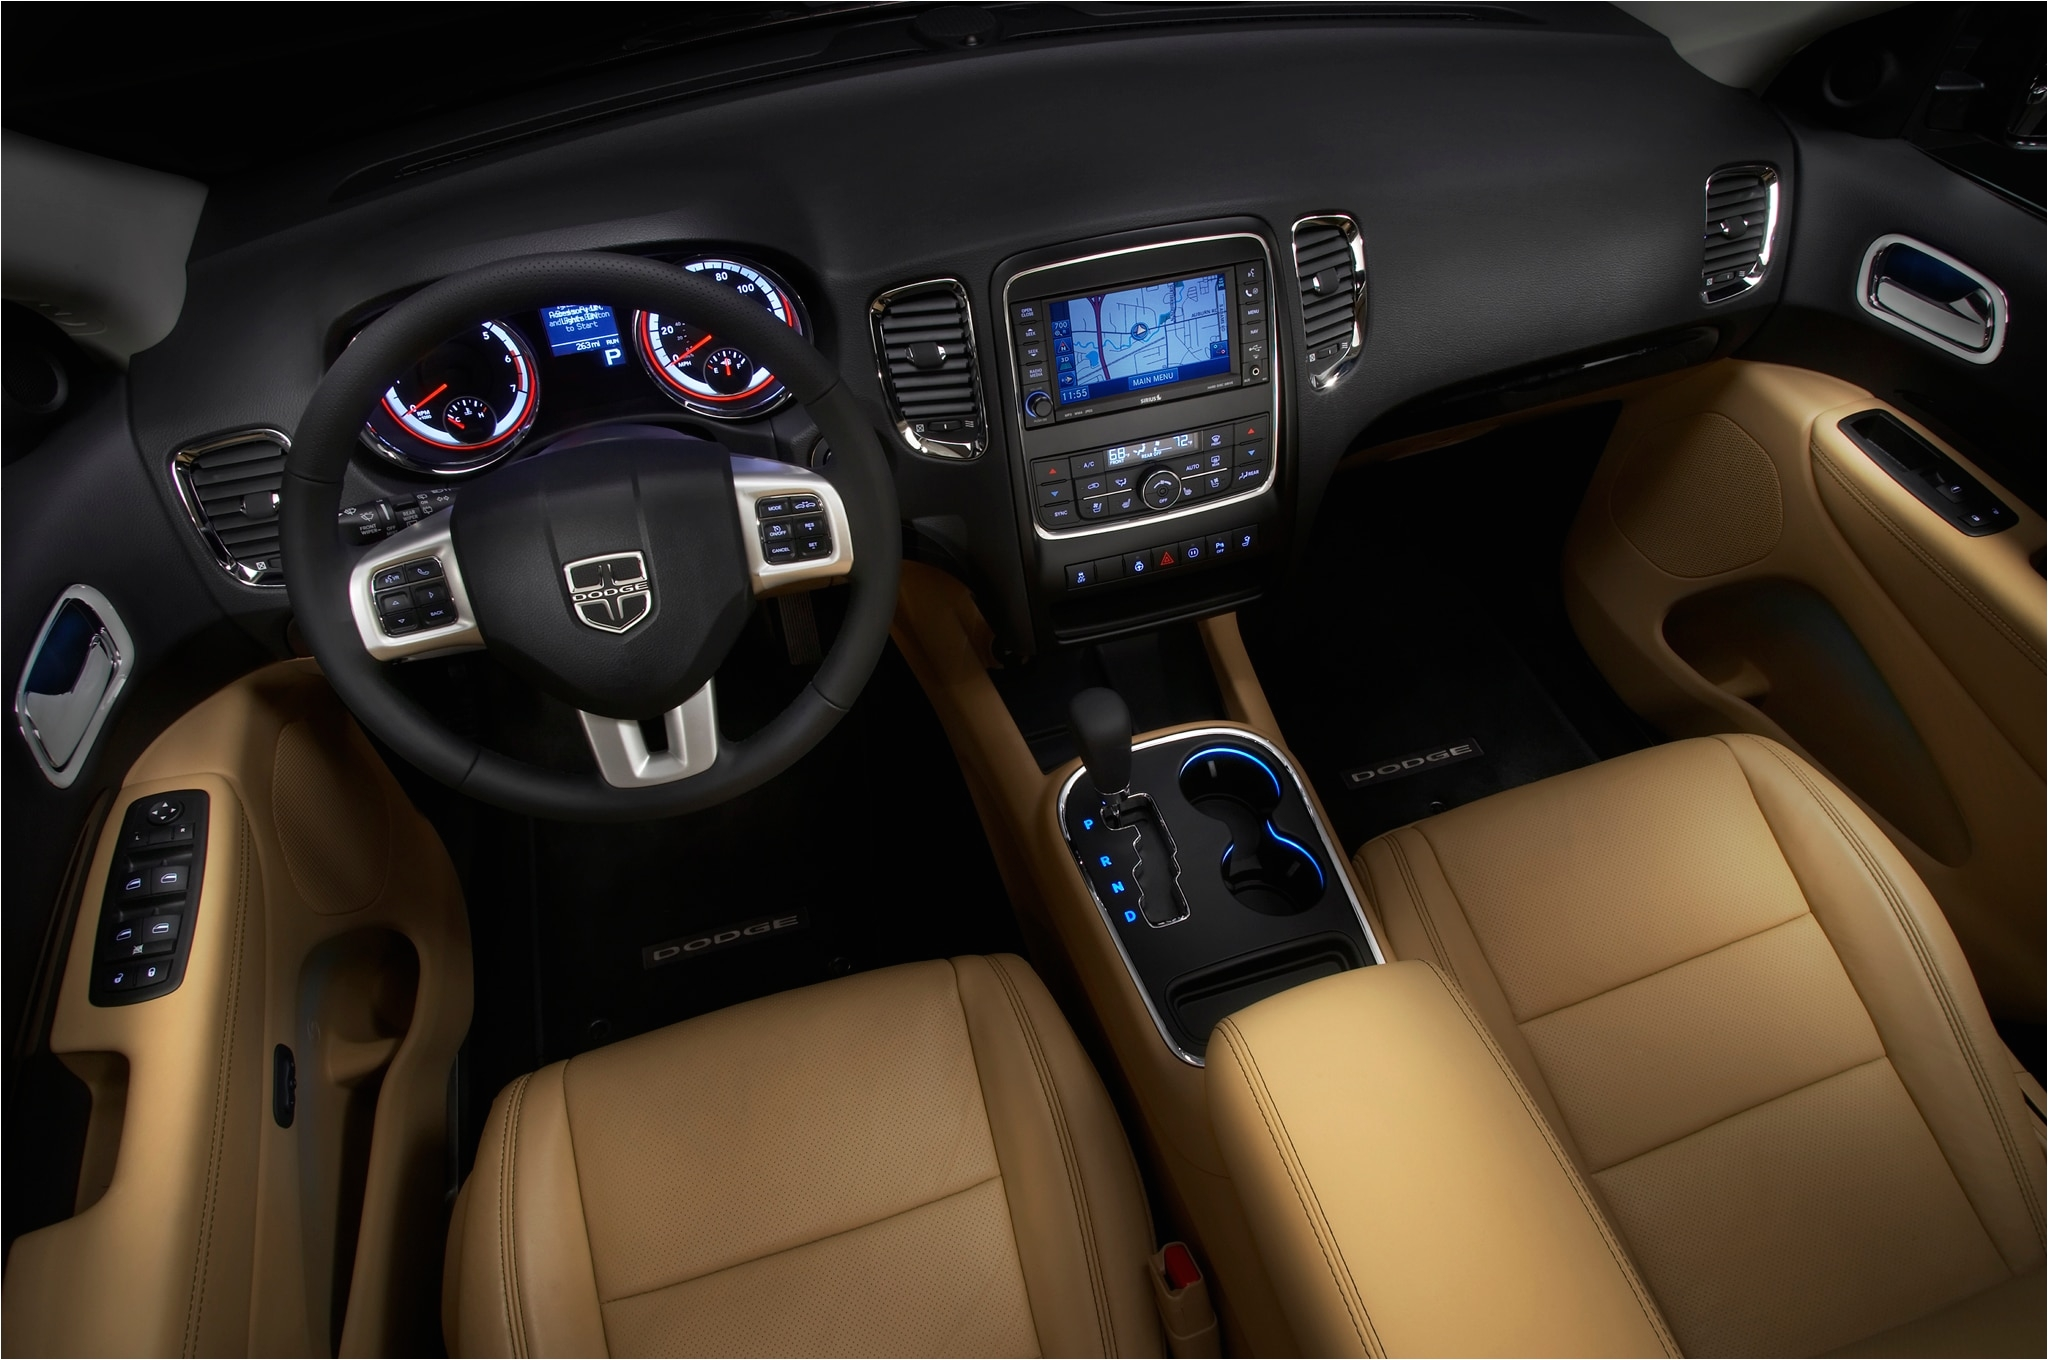 2015 Dodge Durango Interior Specs New York 2013 2014 Dodge Durango is Dead On Arrival